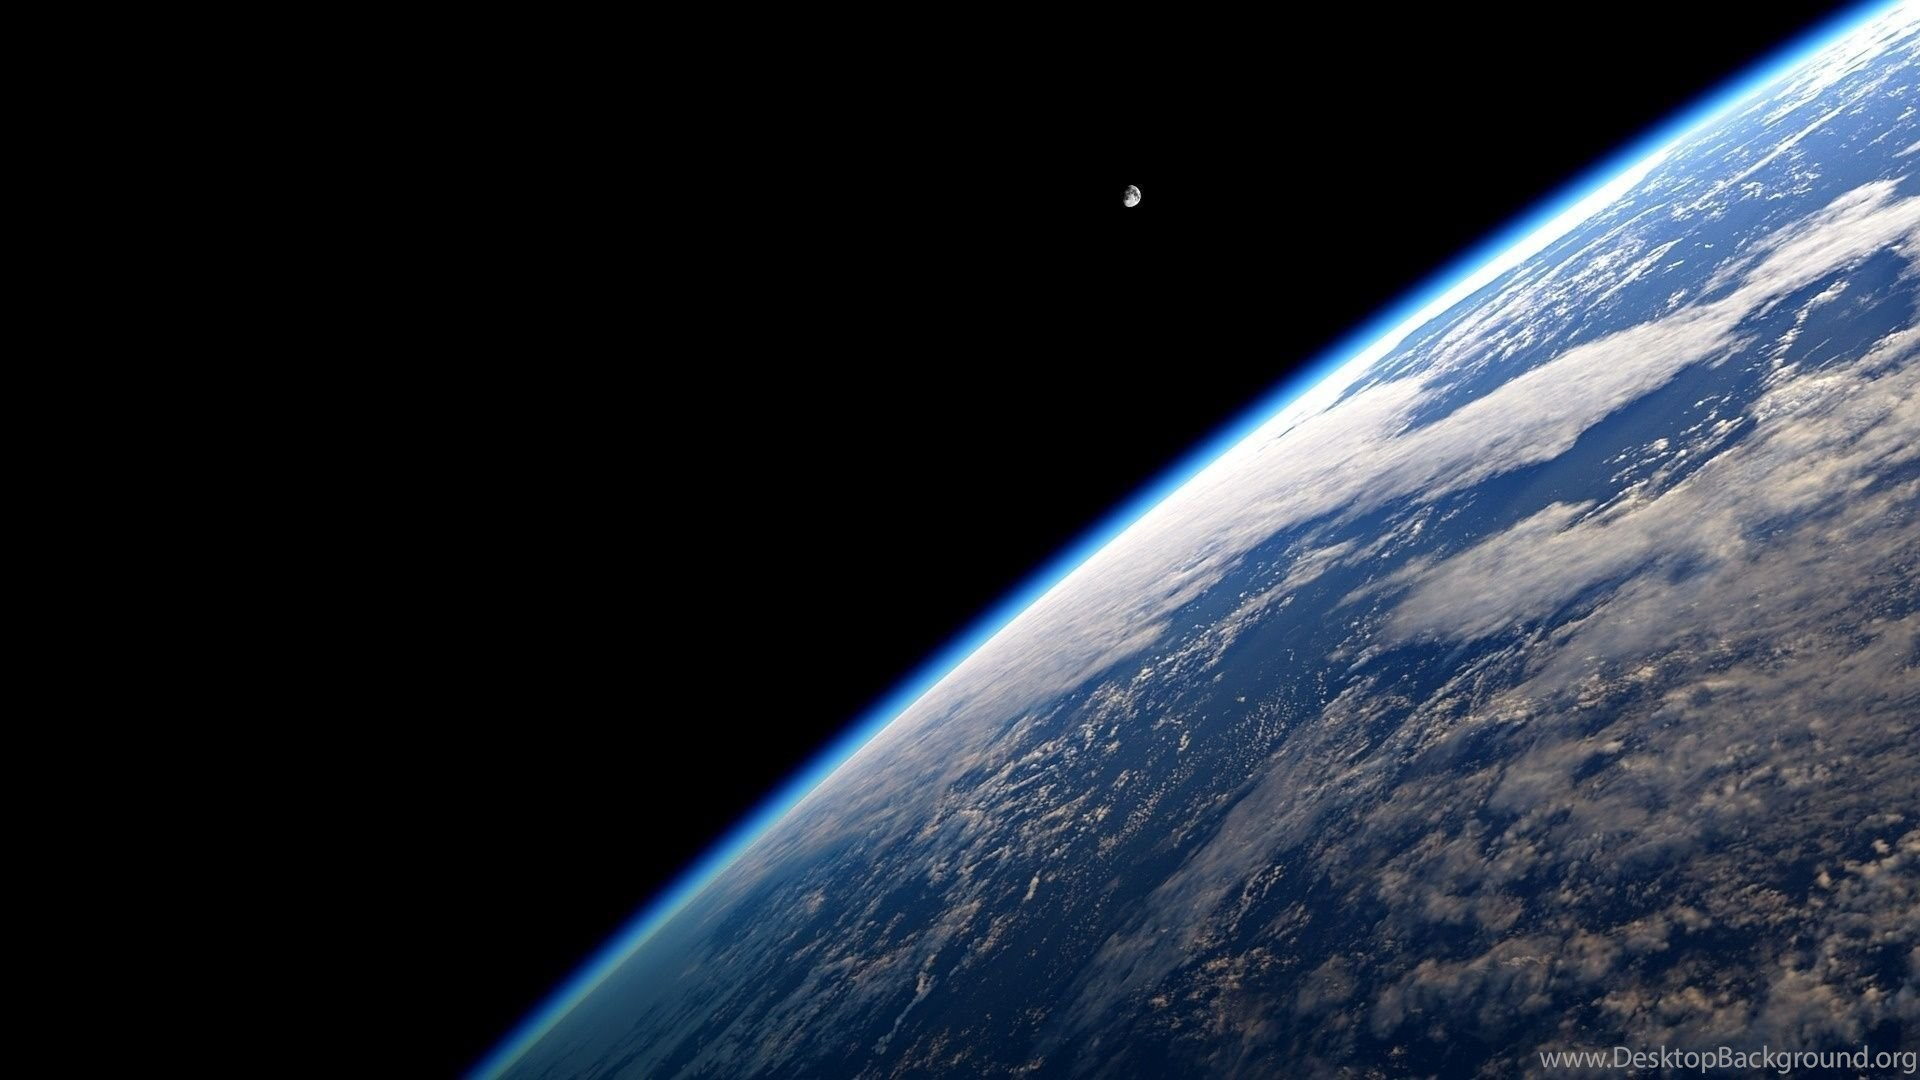 Epic Space Wallpaper Backgrounds Download Desktop Background